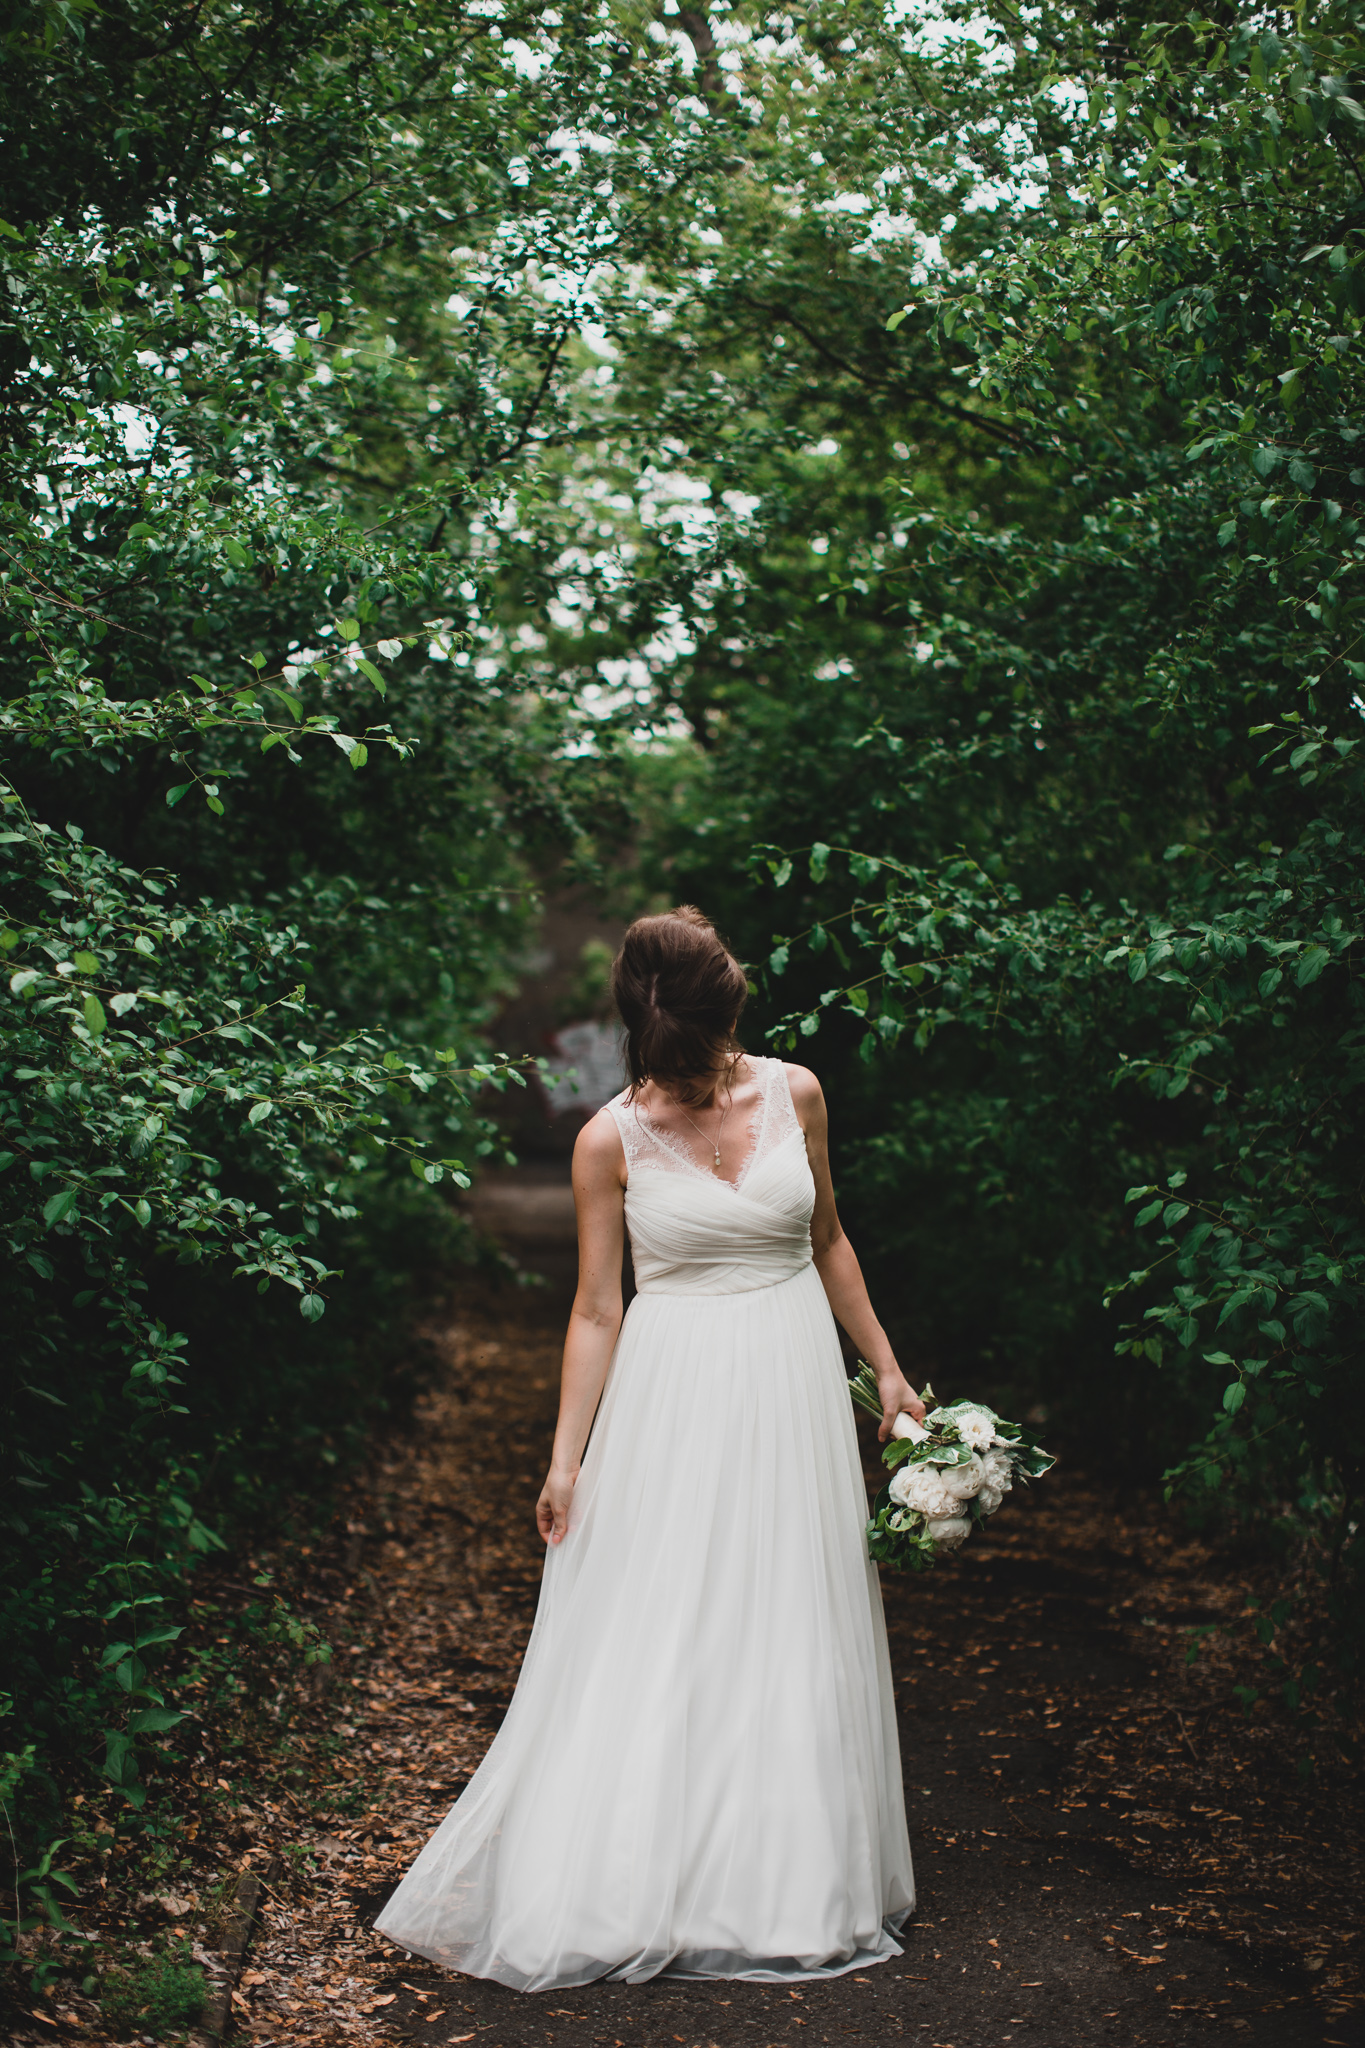 208-WEB-Jonathan-Kuhn-Photography-ClareConor-Wedding-6670.jpg